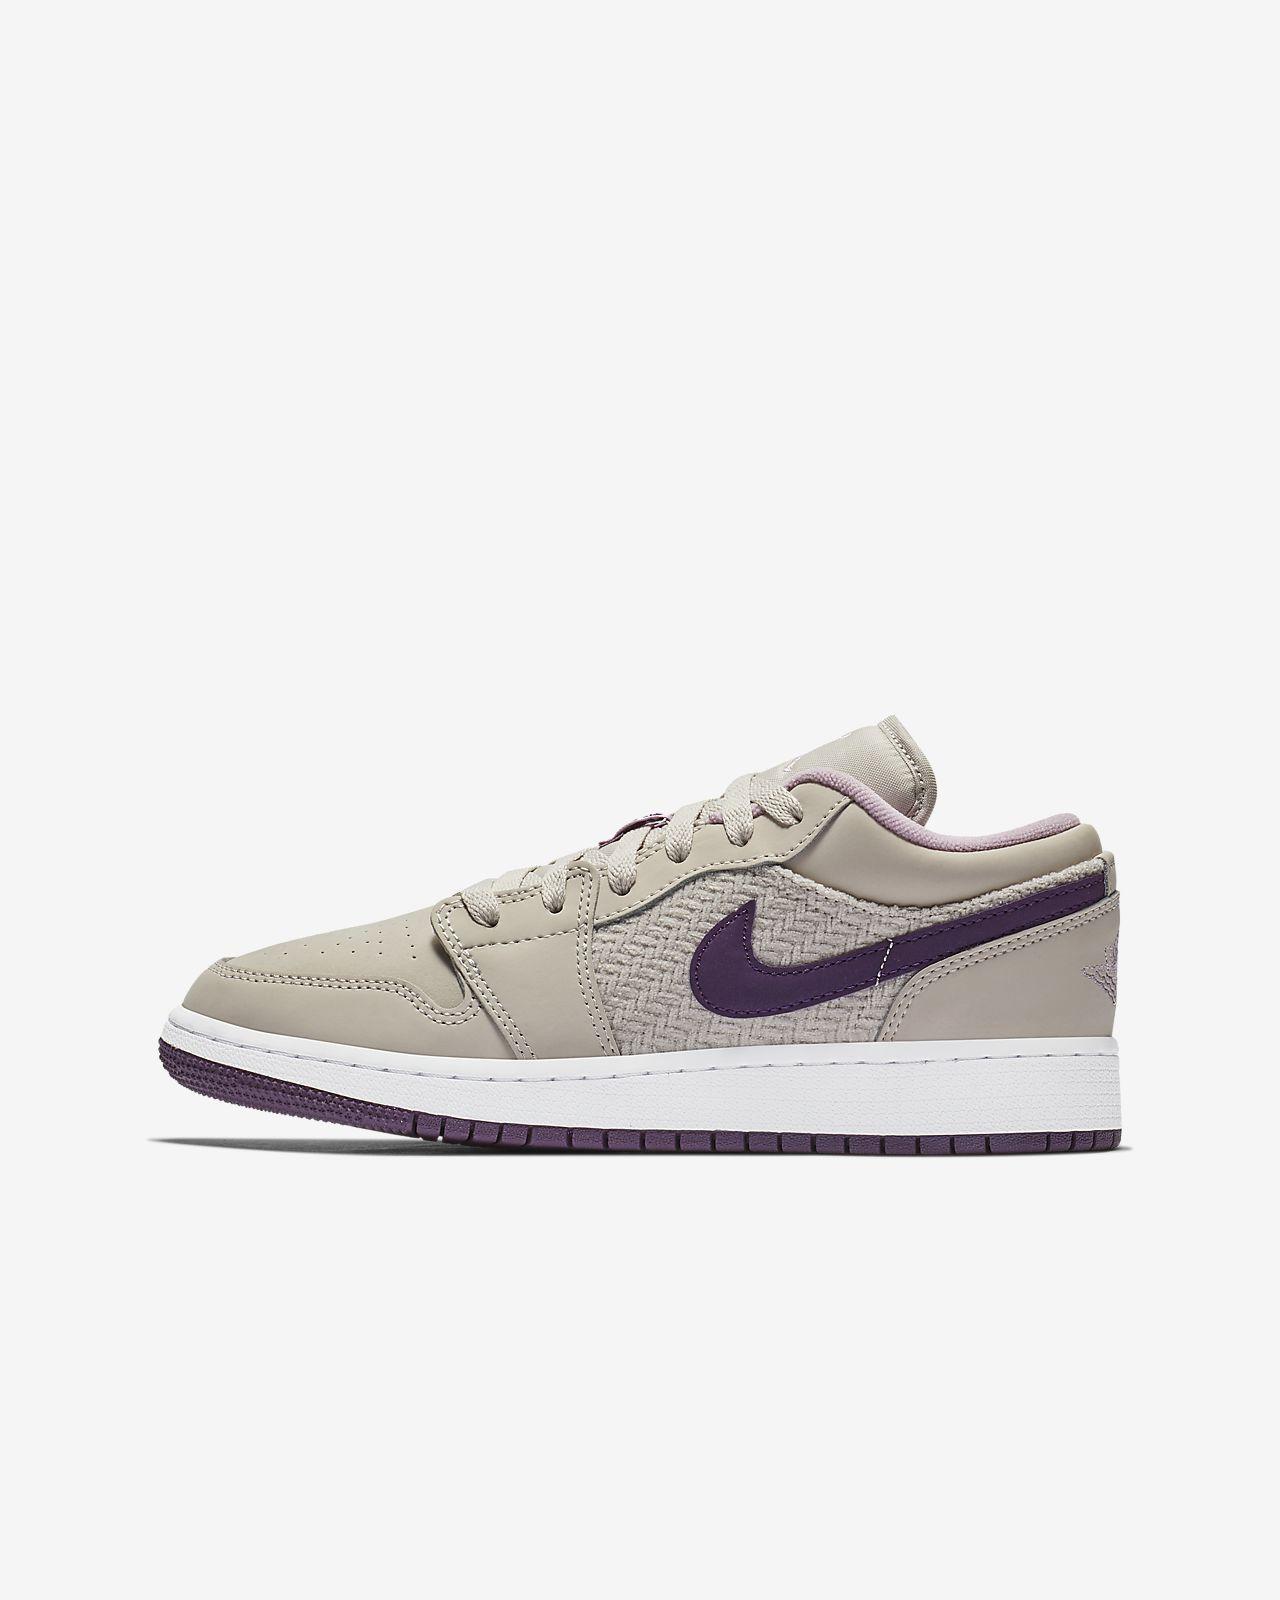 separation shoes 8cc4e 86d9e ... Air Jordan 1 Low Big Kids (Girls ) Shoe ...